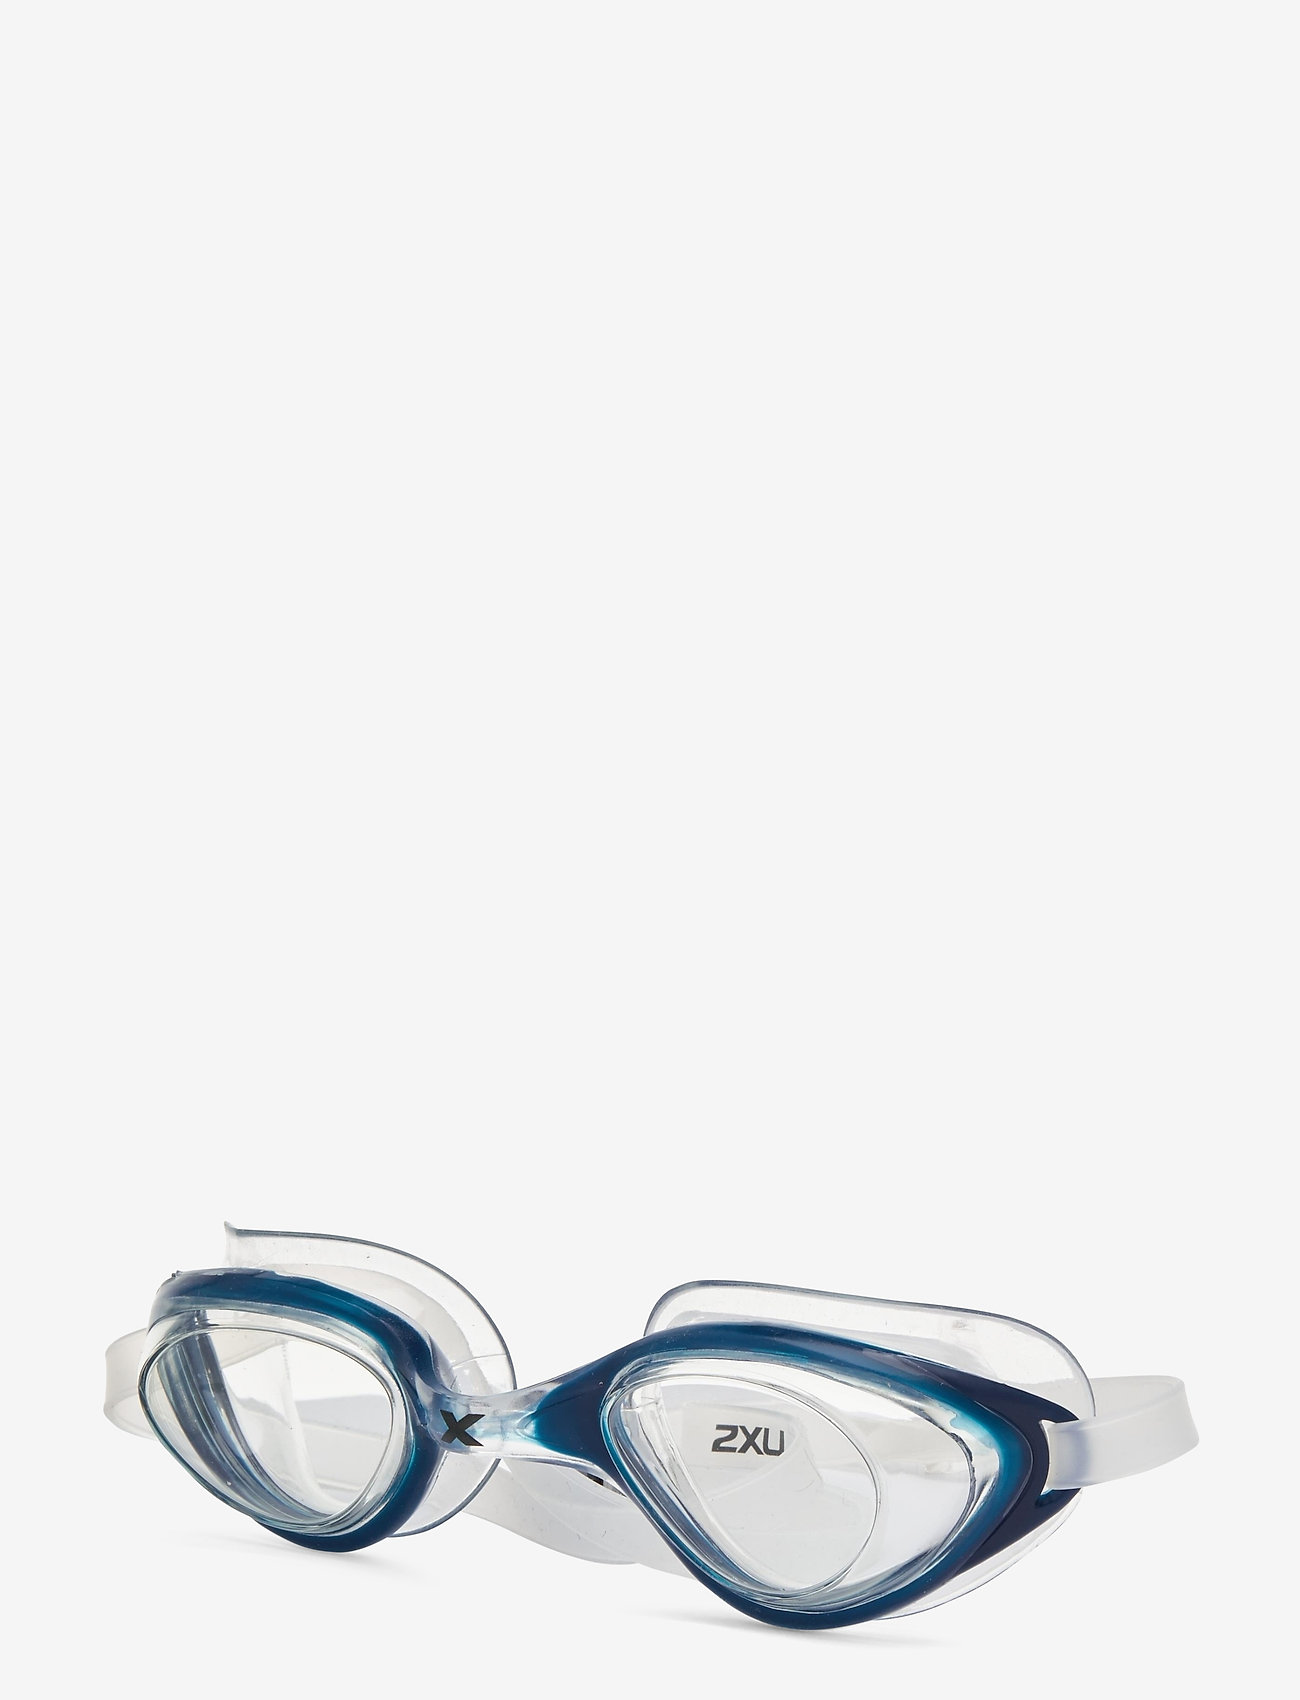 2XU - RIVAL GOGGLE - CLEAR - bril - clear/blue - 1